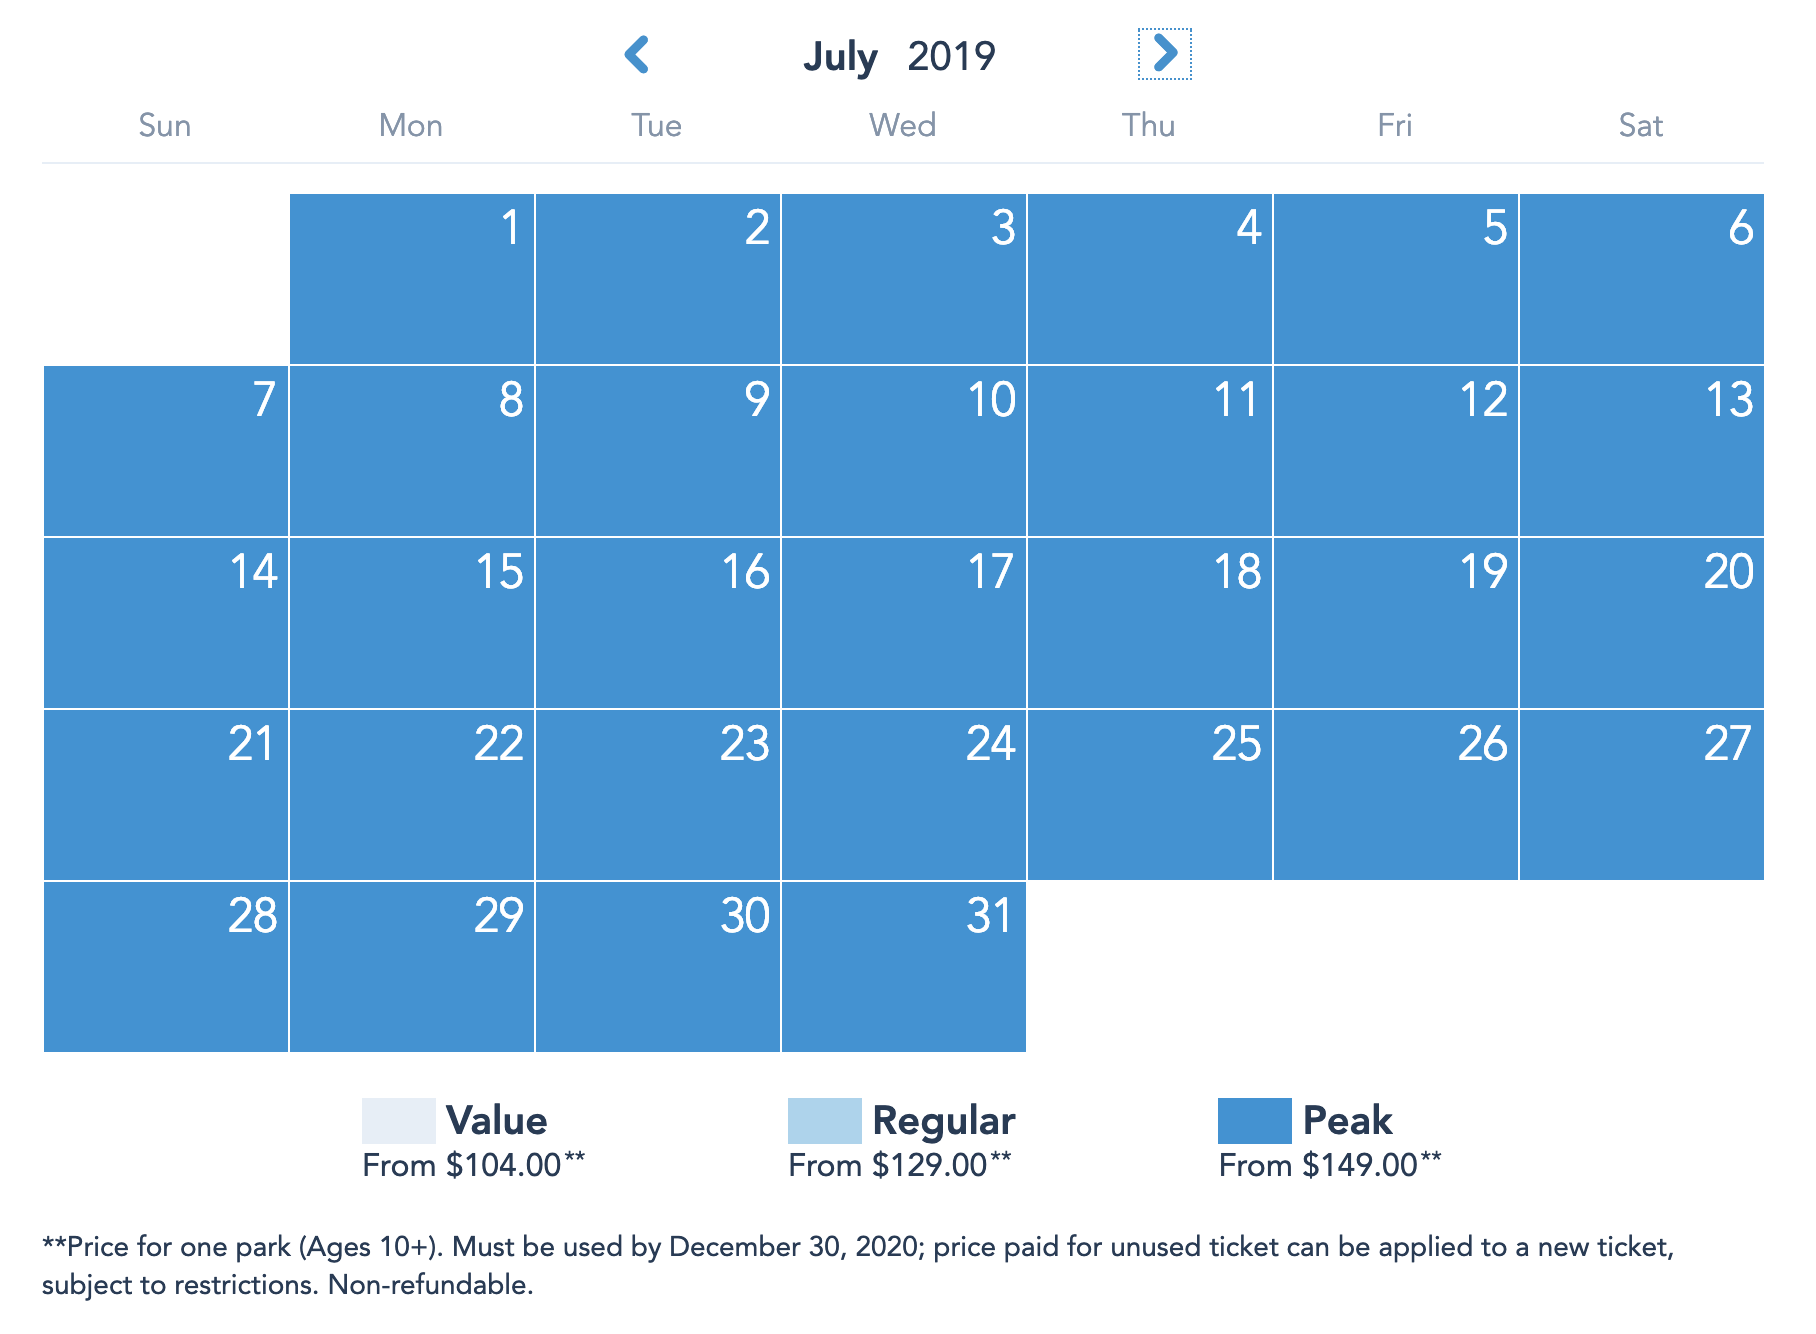 Disneyland Resort Prices - July